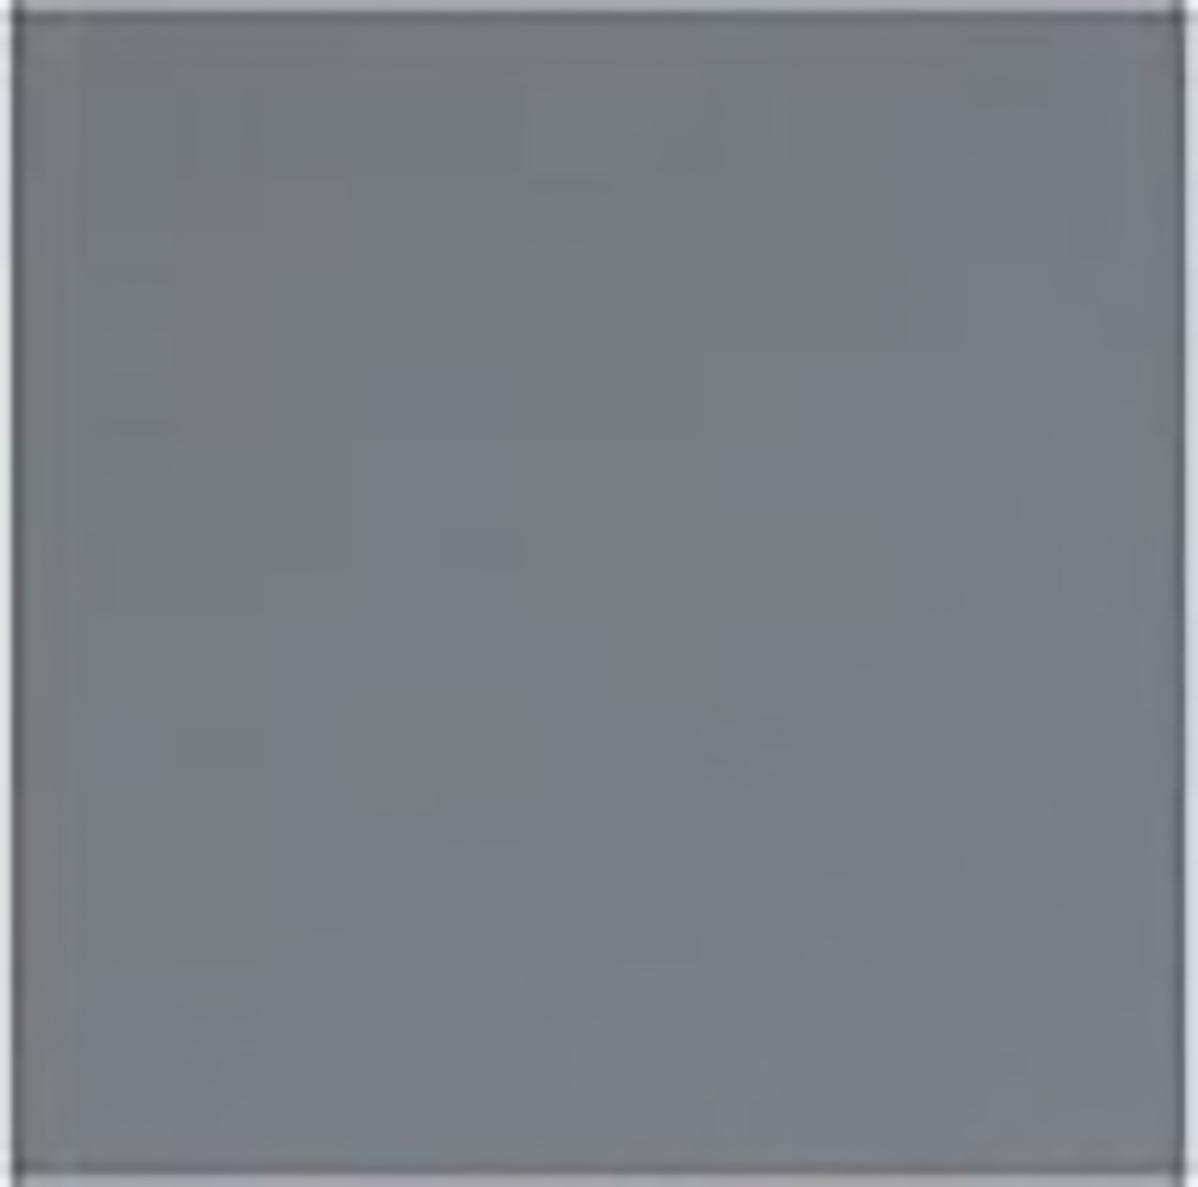 Sigma Gris Oscuro 20 x 20